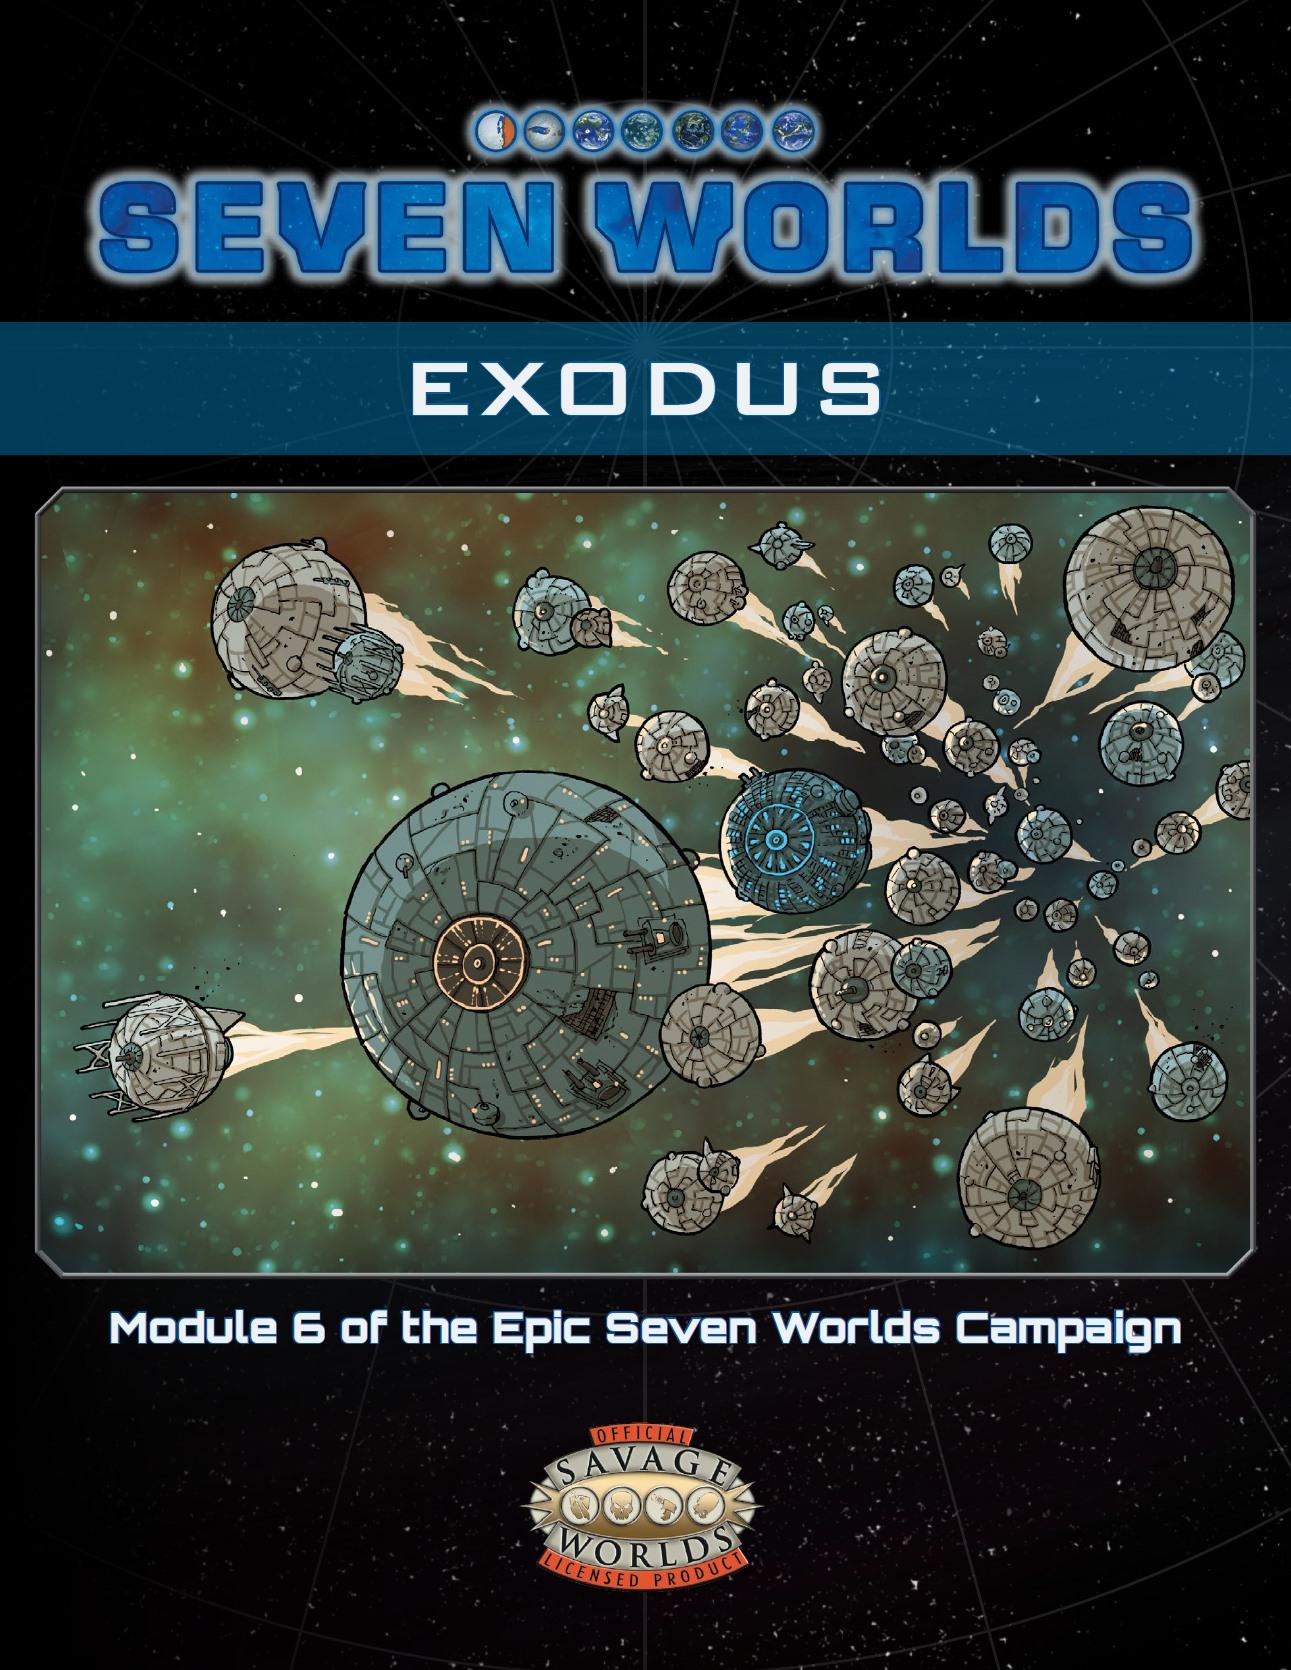 Module 6 - Exodus